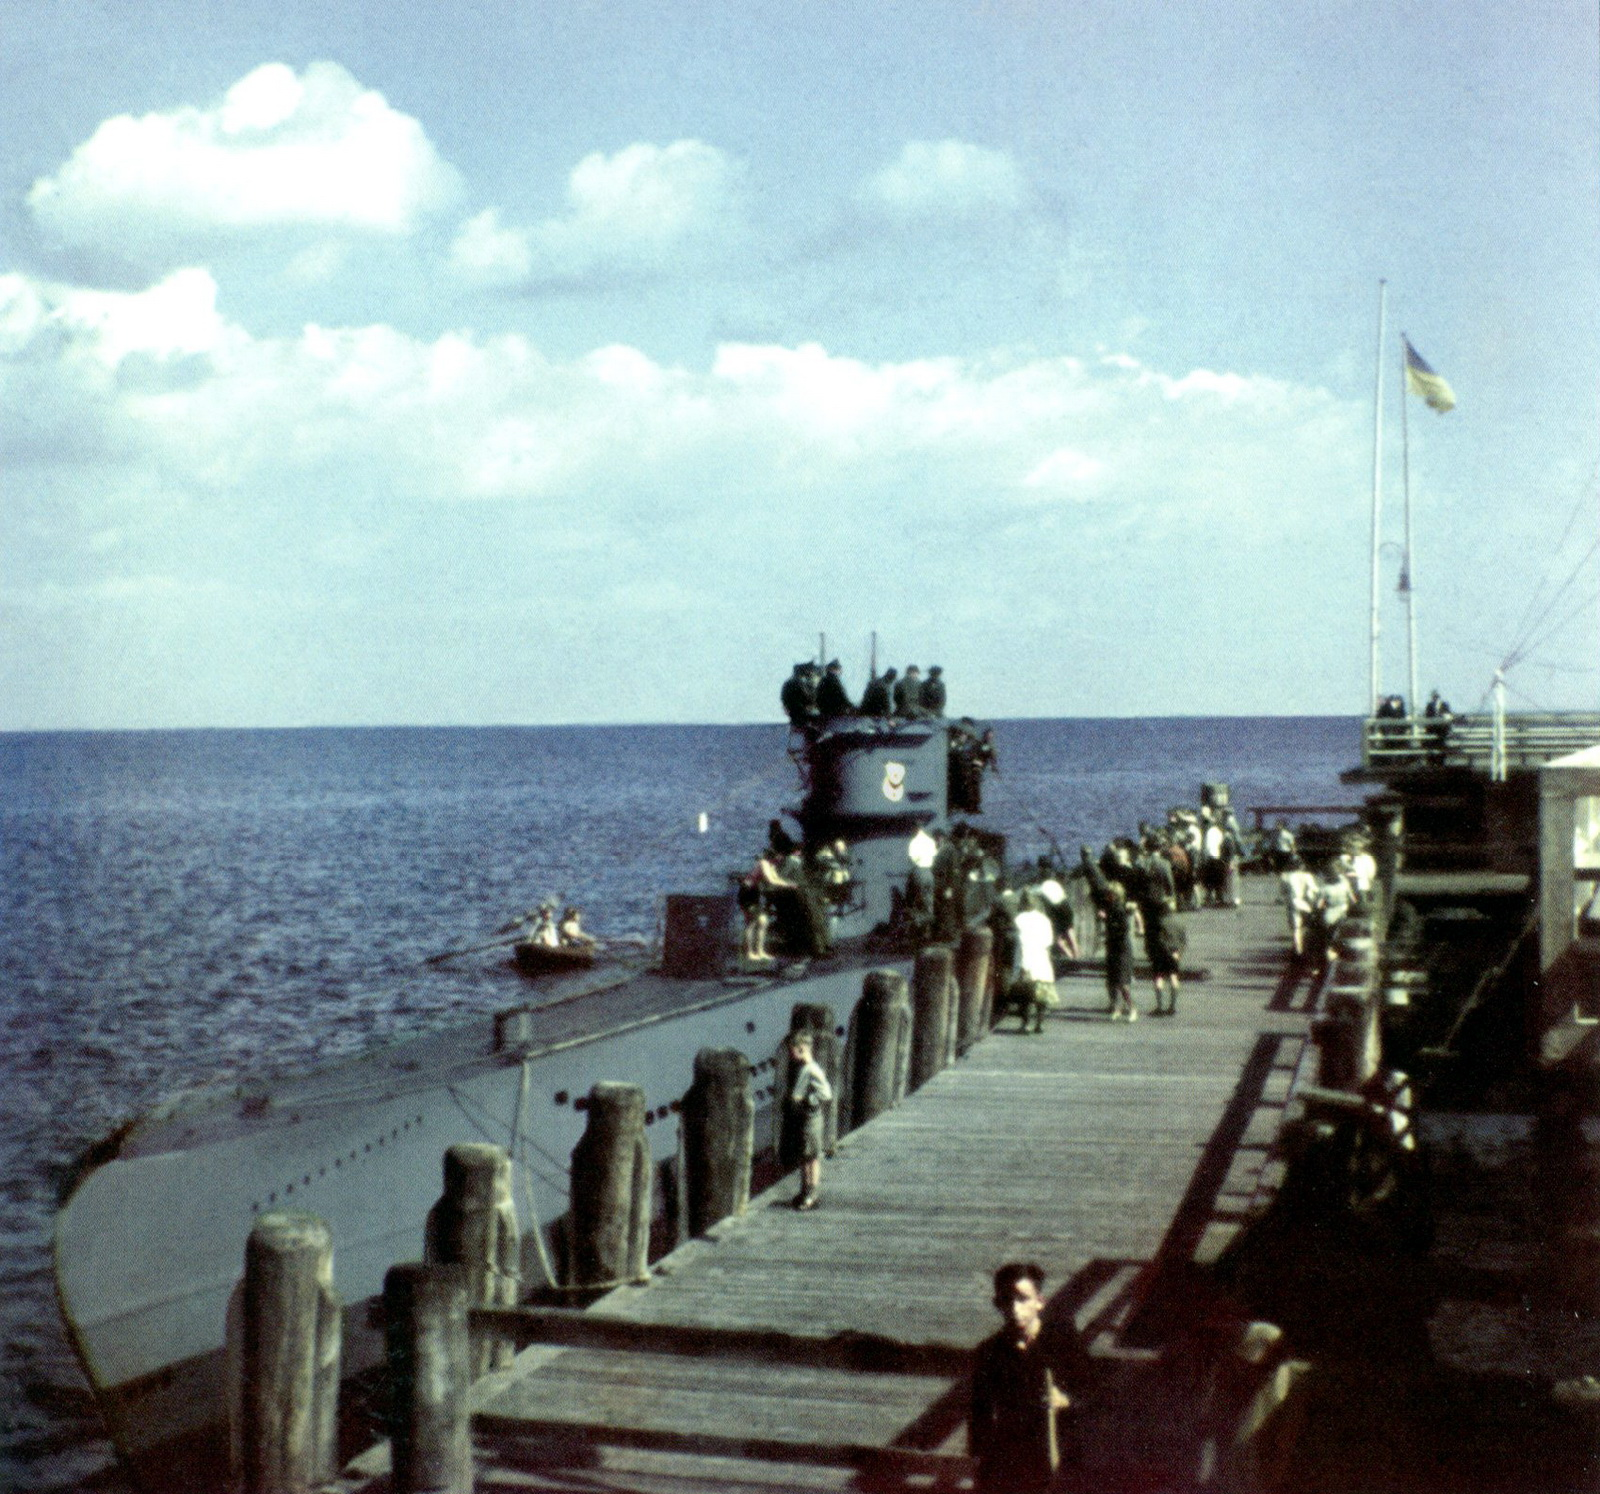 Color%2BGerman%2BU-boat%2Bsubmarine%2BKriegsmarine%2BNavy%2BNazi%2BU-403%2BZoppot%2BDanzig%2BBay.jpg